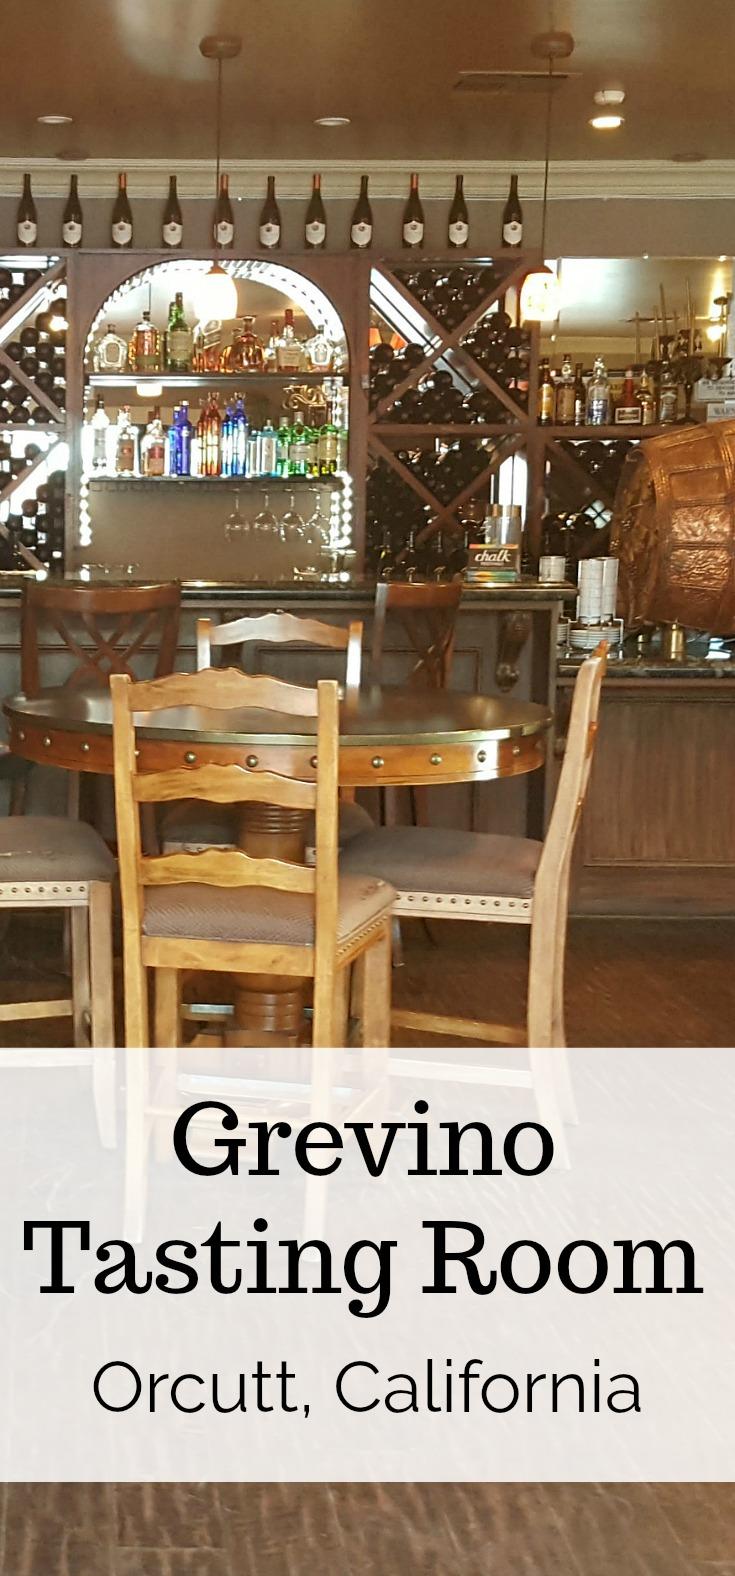 Ca' Del Grevino Santa Maria Valley Wine Tasting Room and Cafe in Orcutt, California